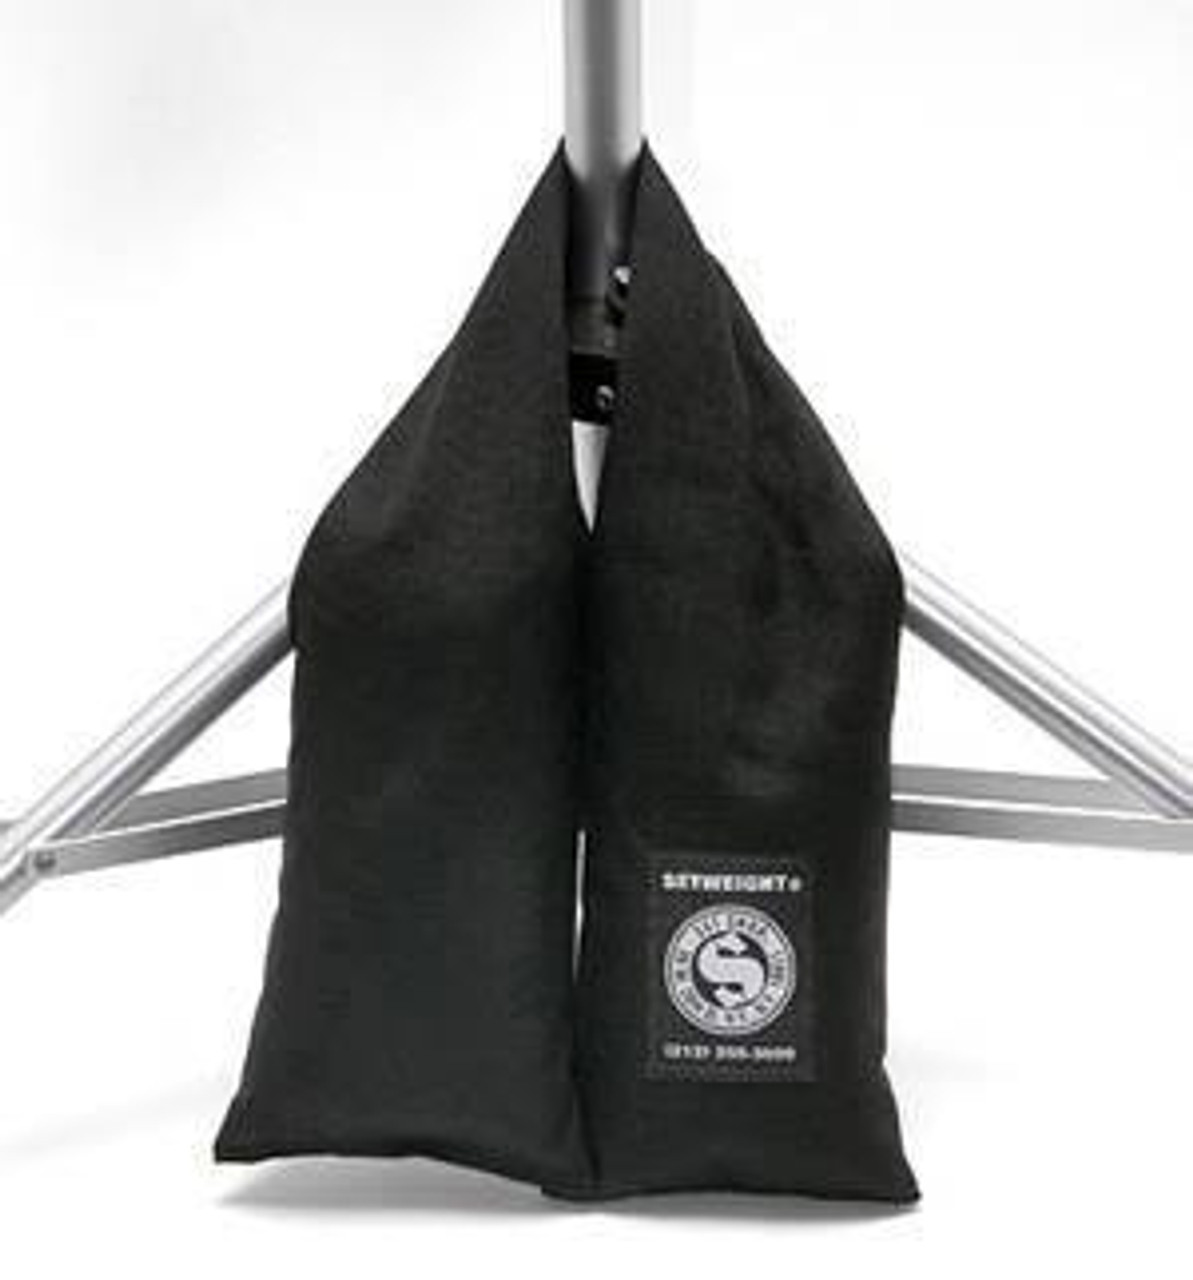 Setweight - Slingshot XL - 16lbs. Sandbag (Black)